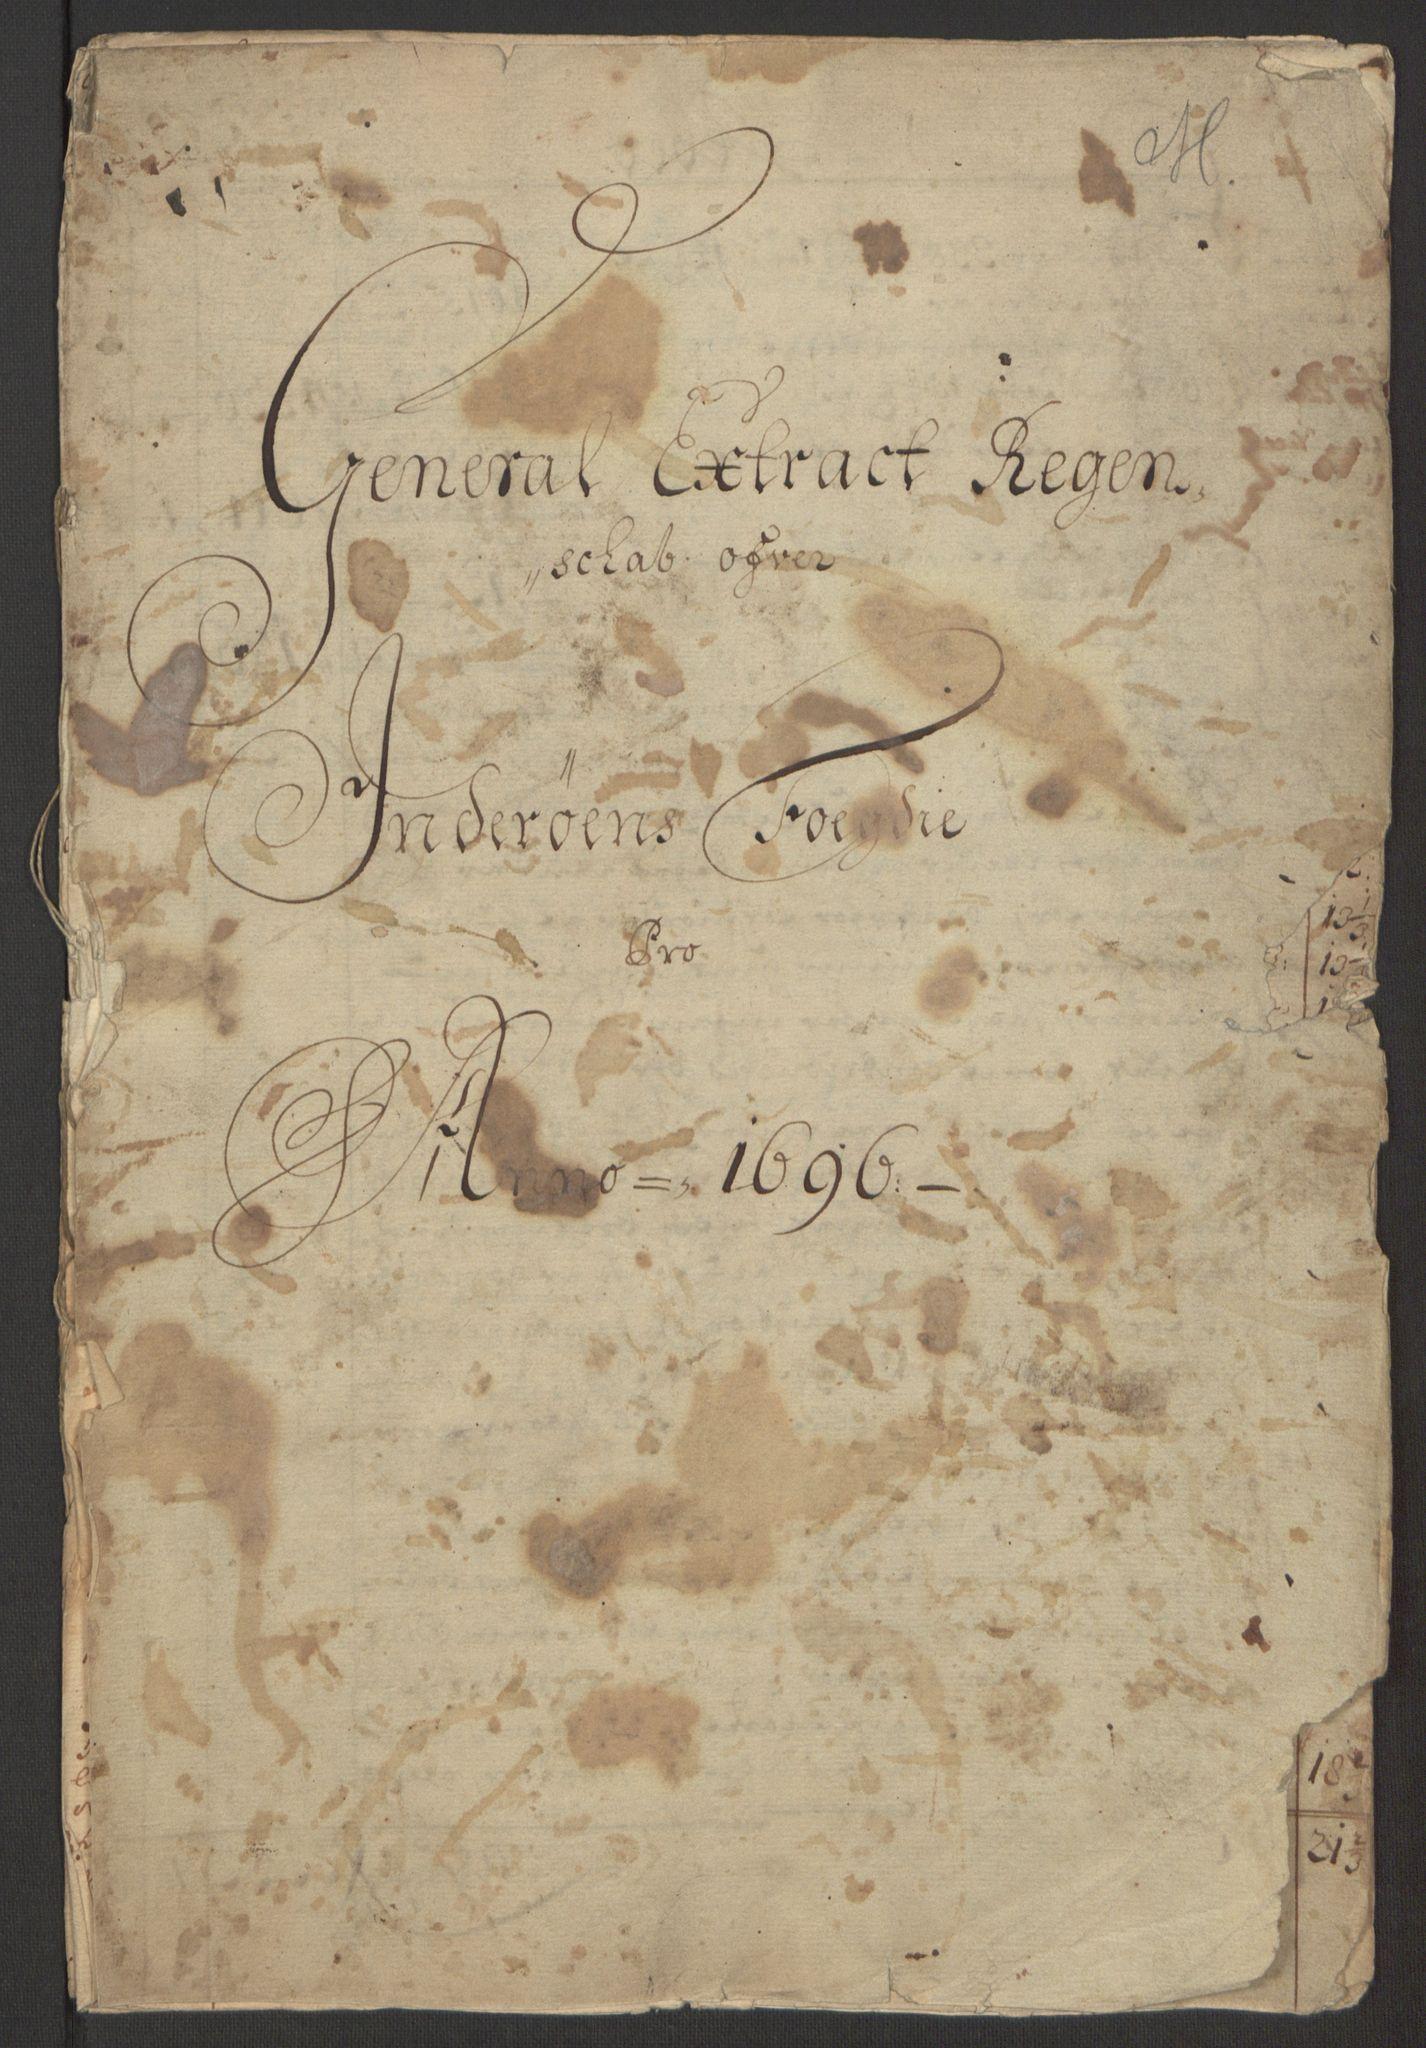 RA, Rentekammeret inntil 1814, Reviderte regnskaper, Fogderegnskap, R63/L4309: Fogderegnskap Inderøy, 1695-1697, s. 122